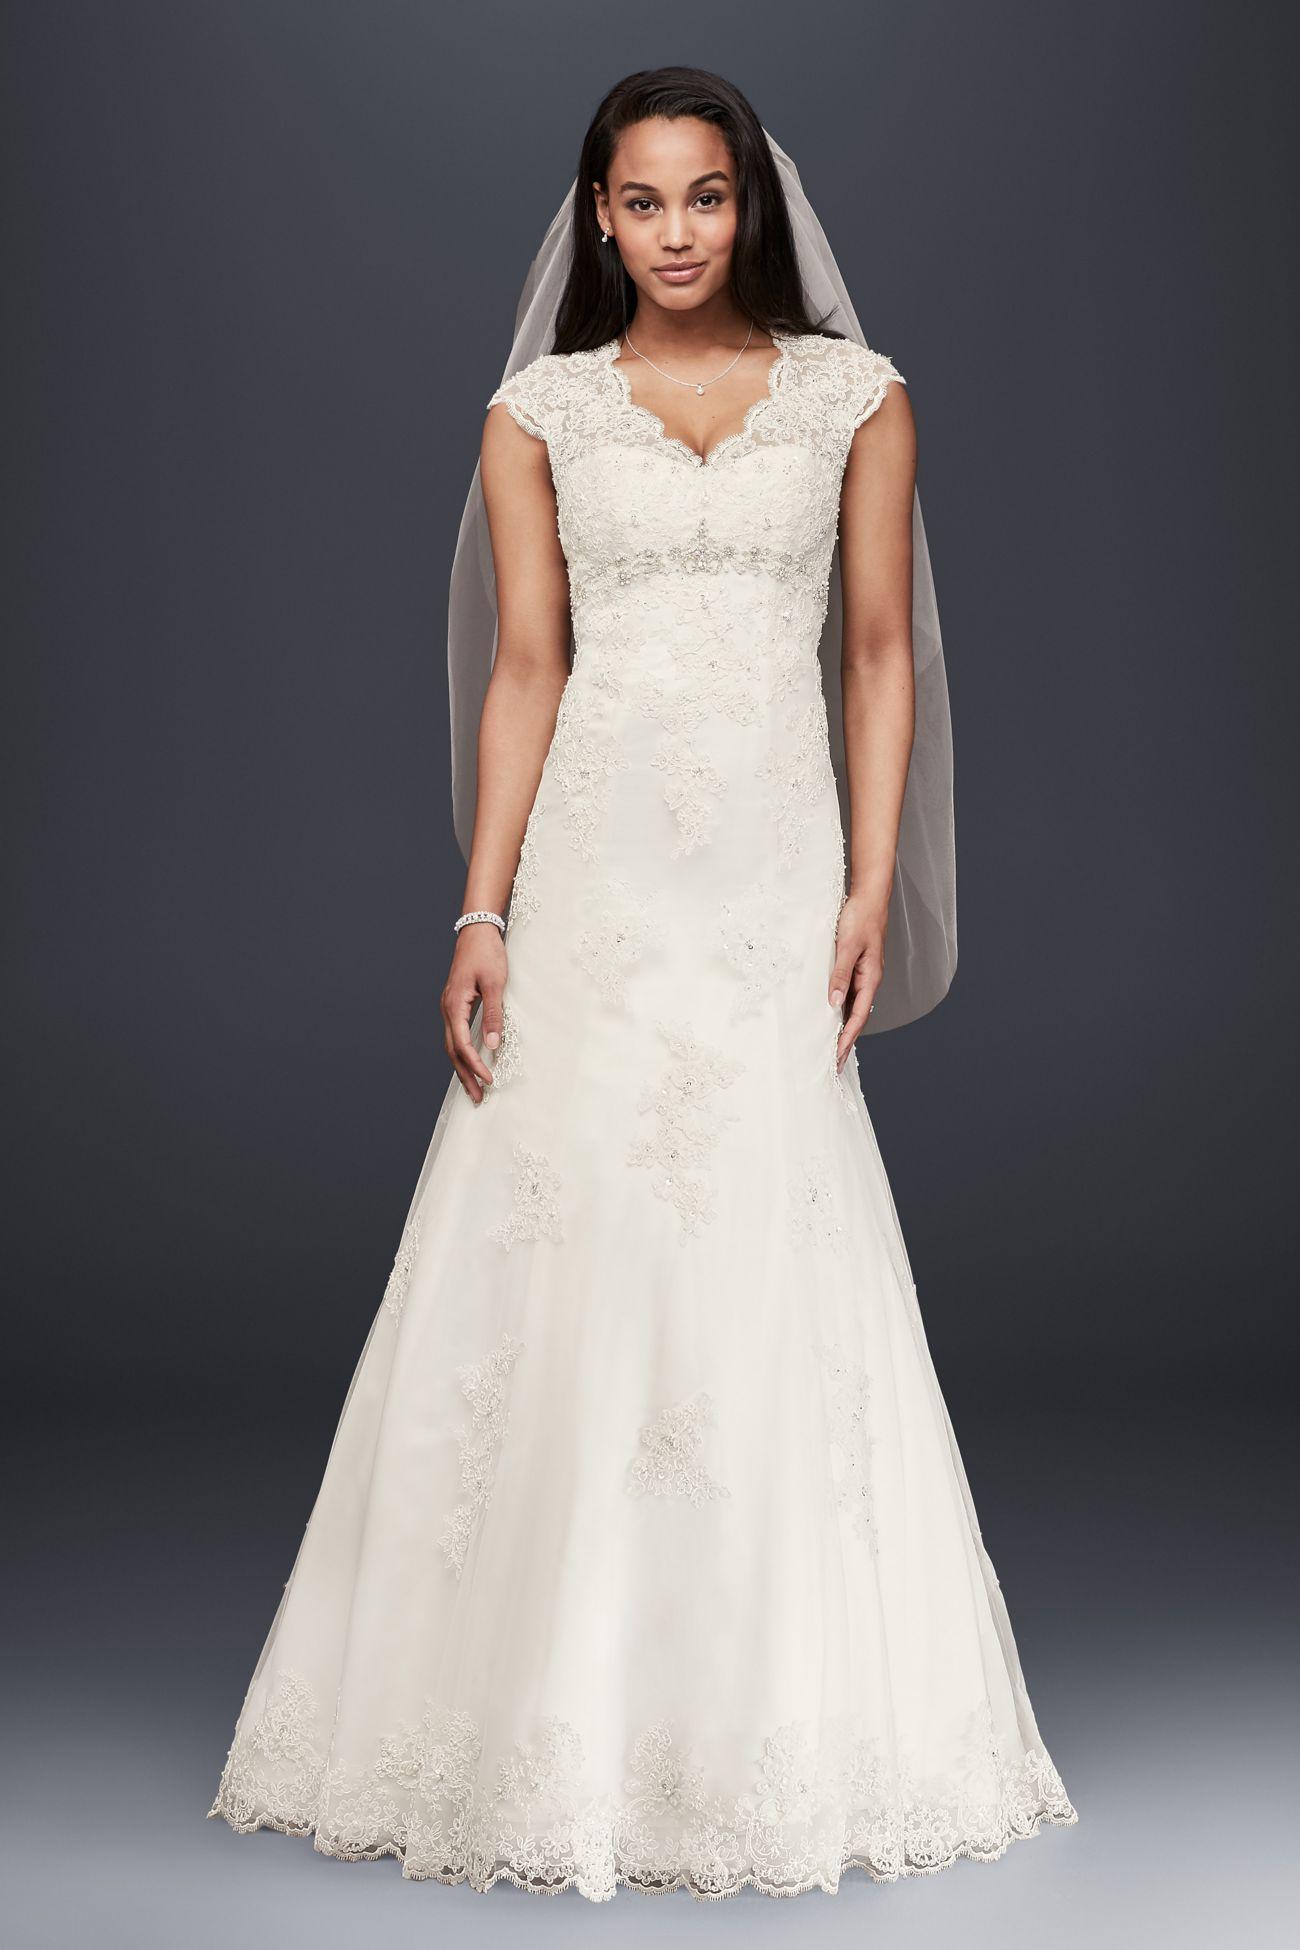 T wedding dress pinterest wedding dress wedding and wedding